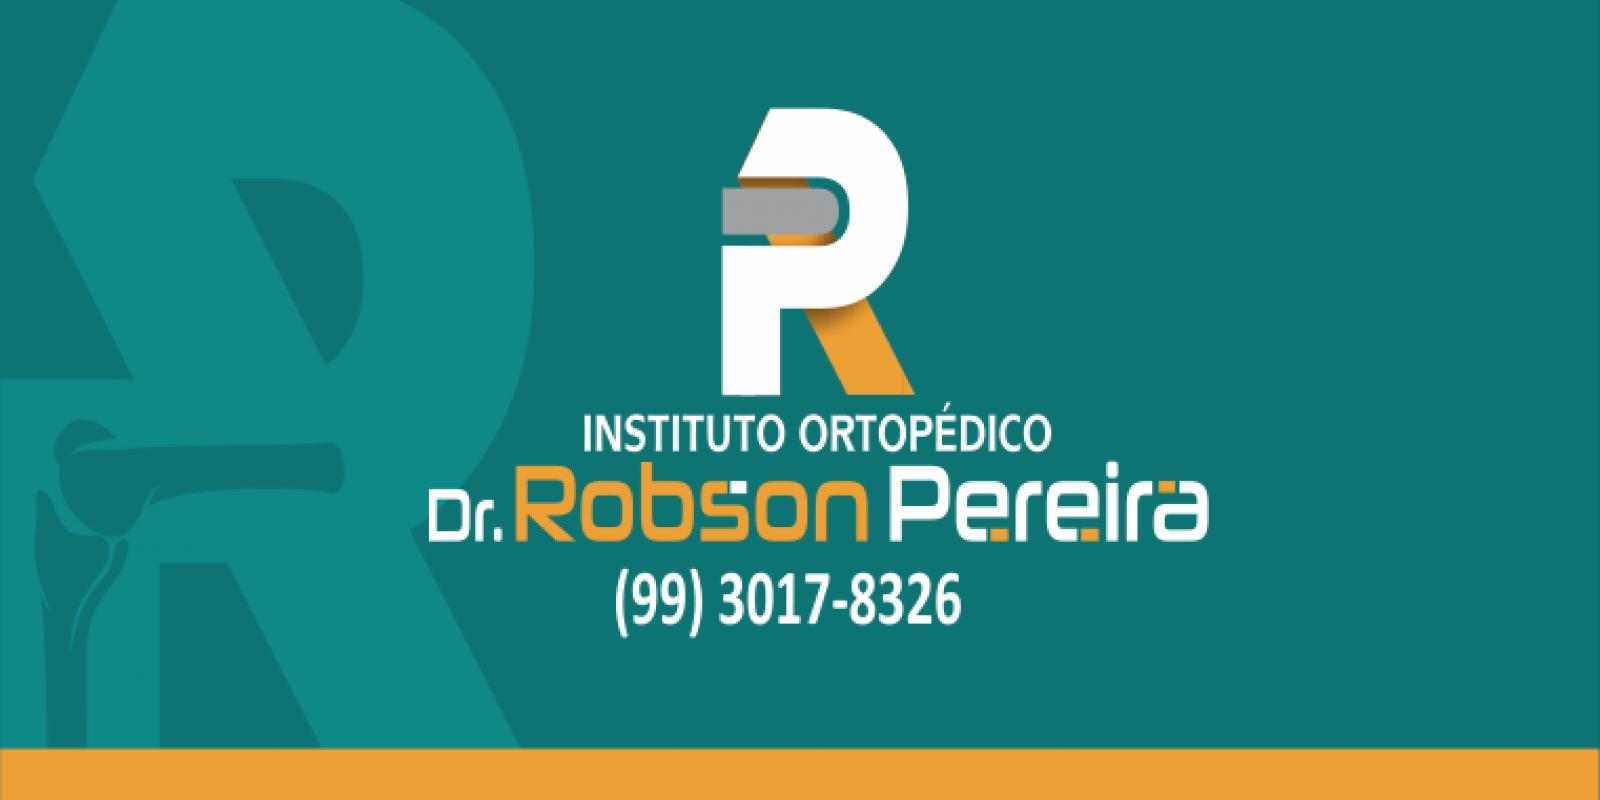 Instituto Ortopédico Dr. Robson Pereira